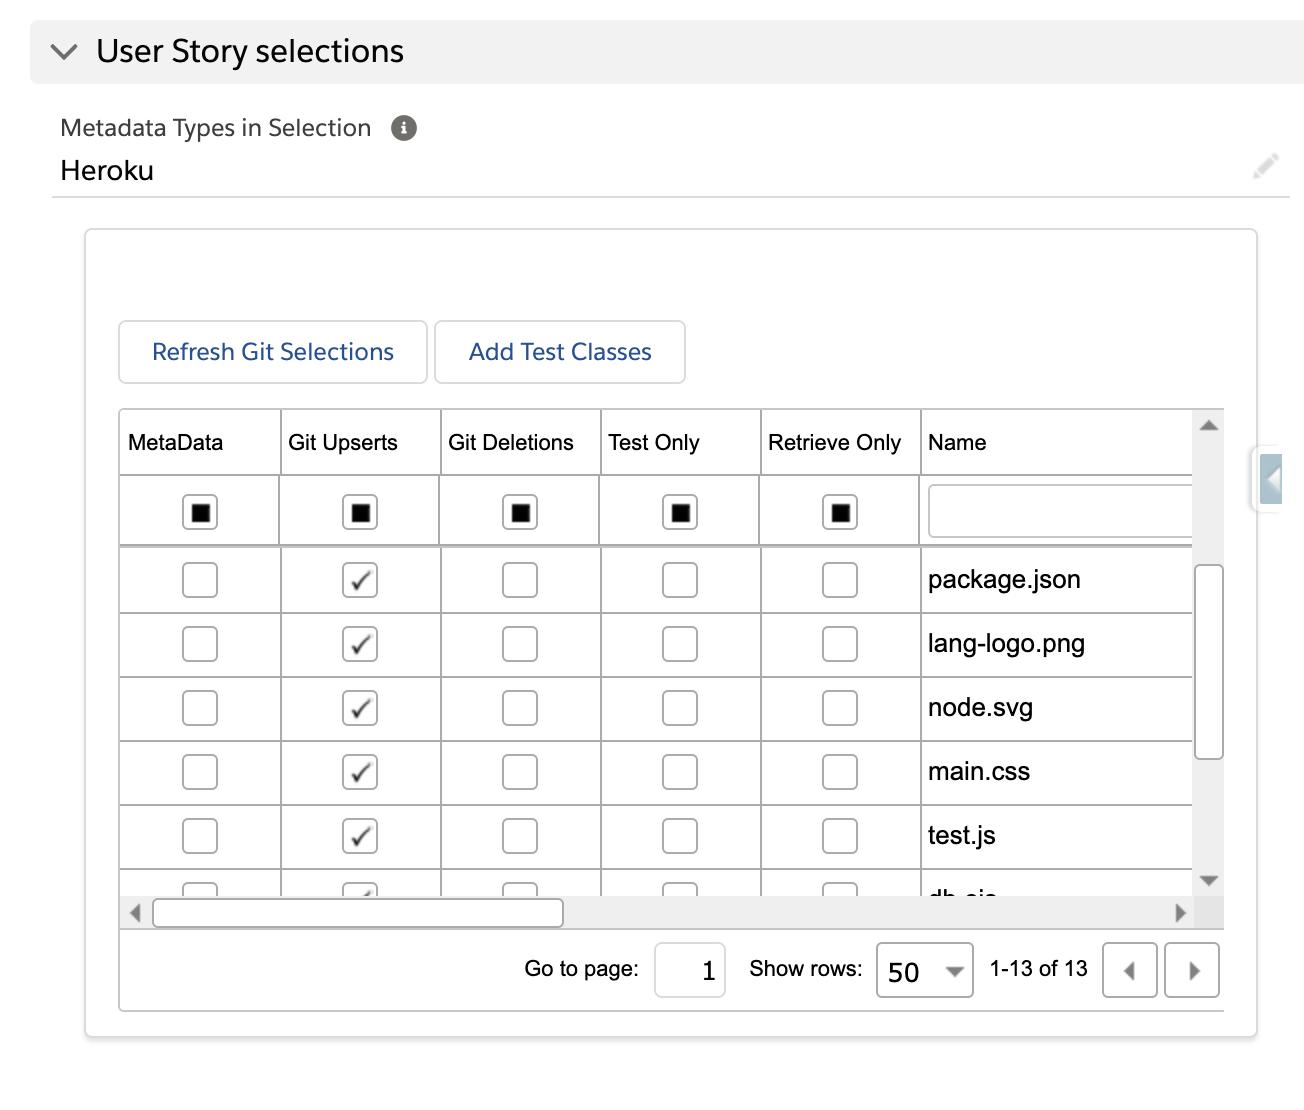 Metadata Selections grid